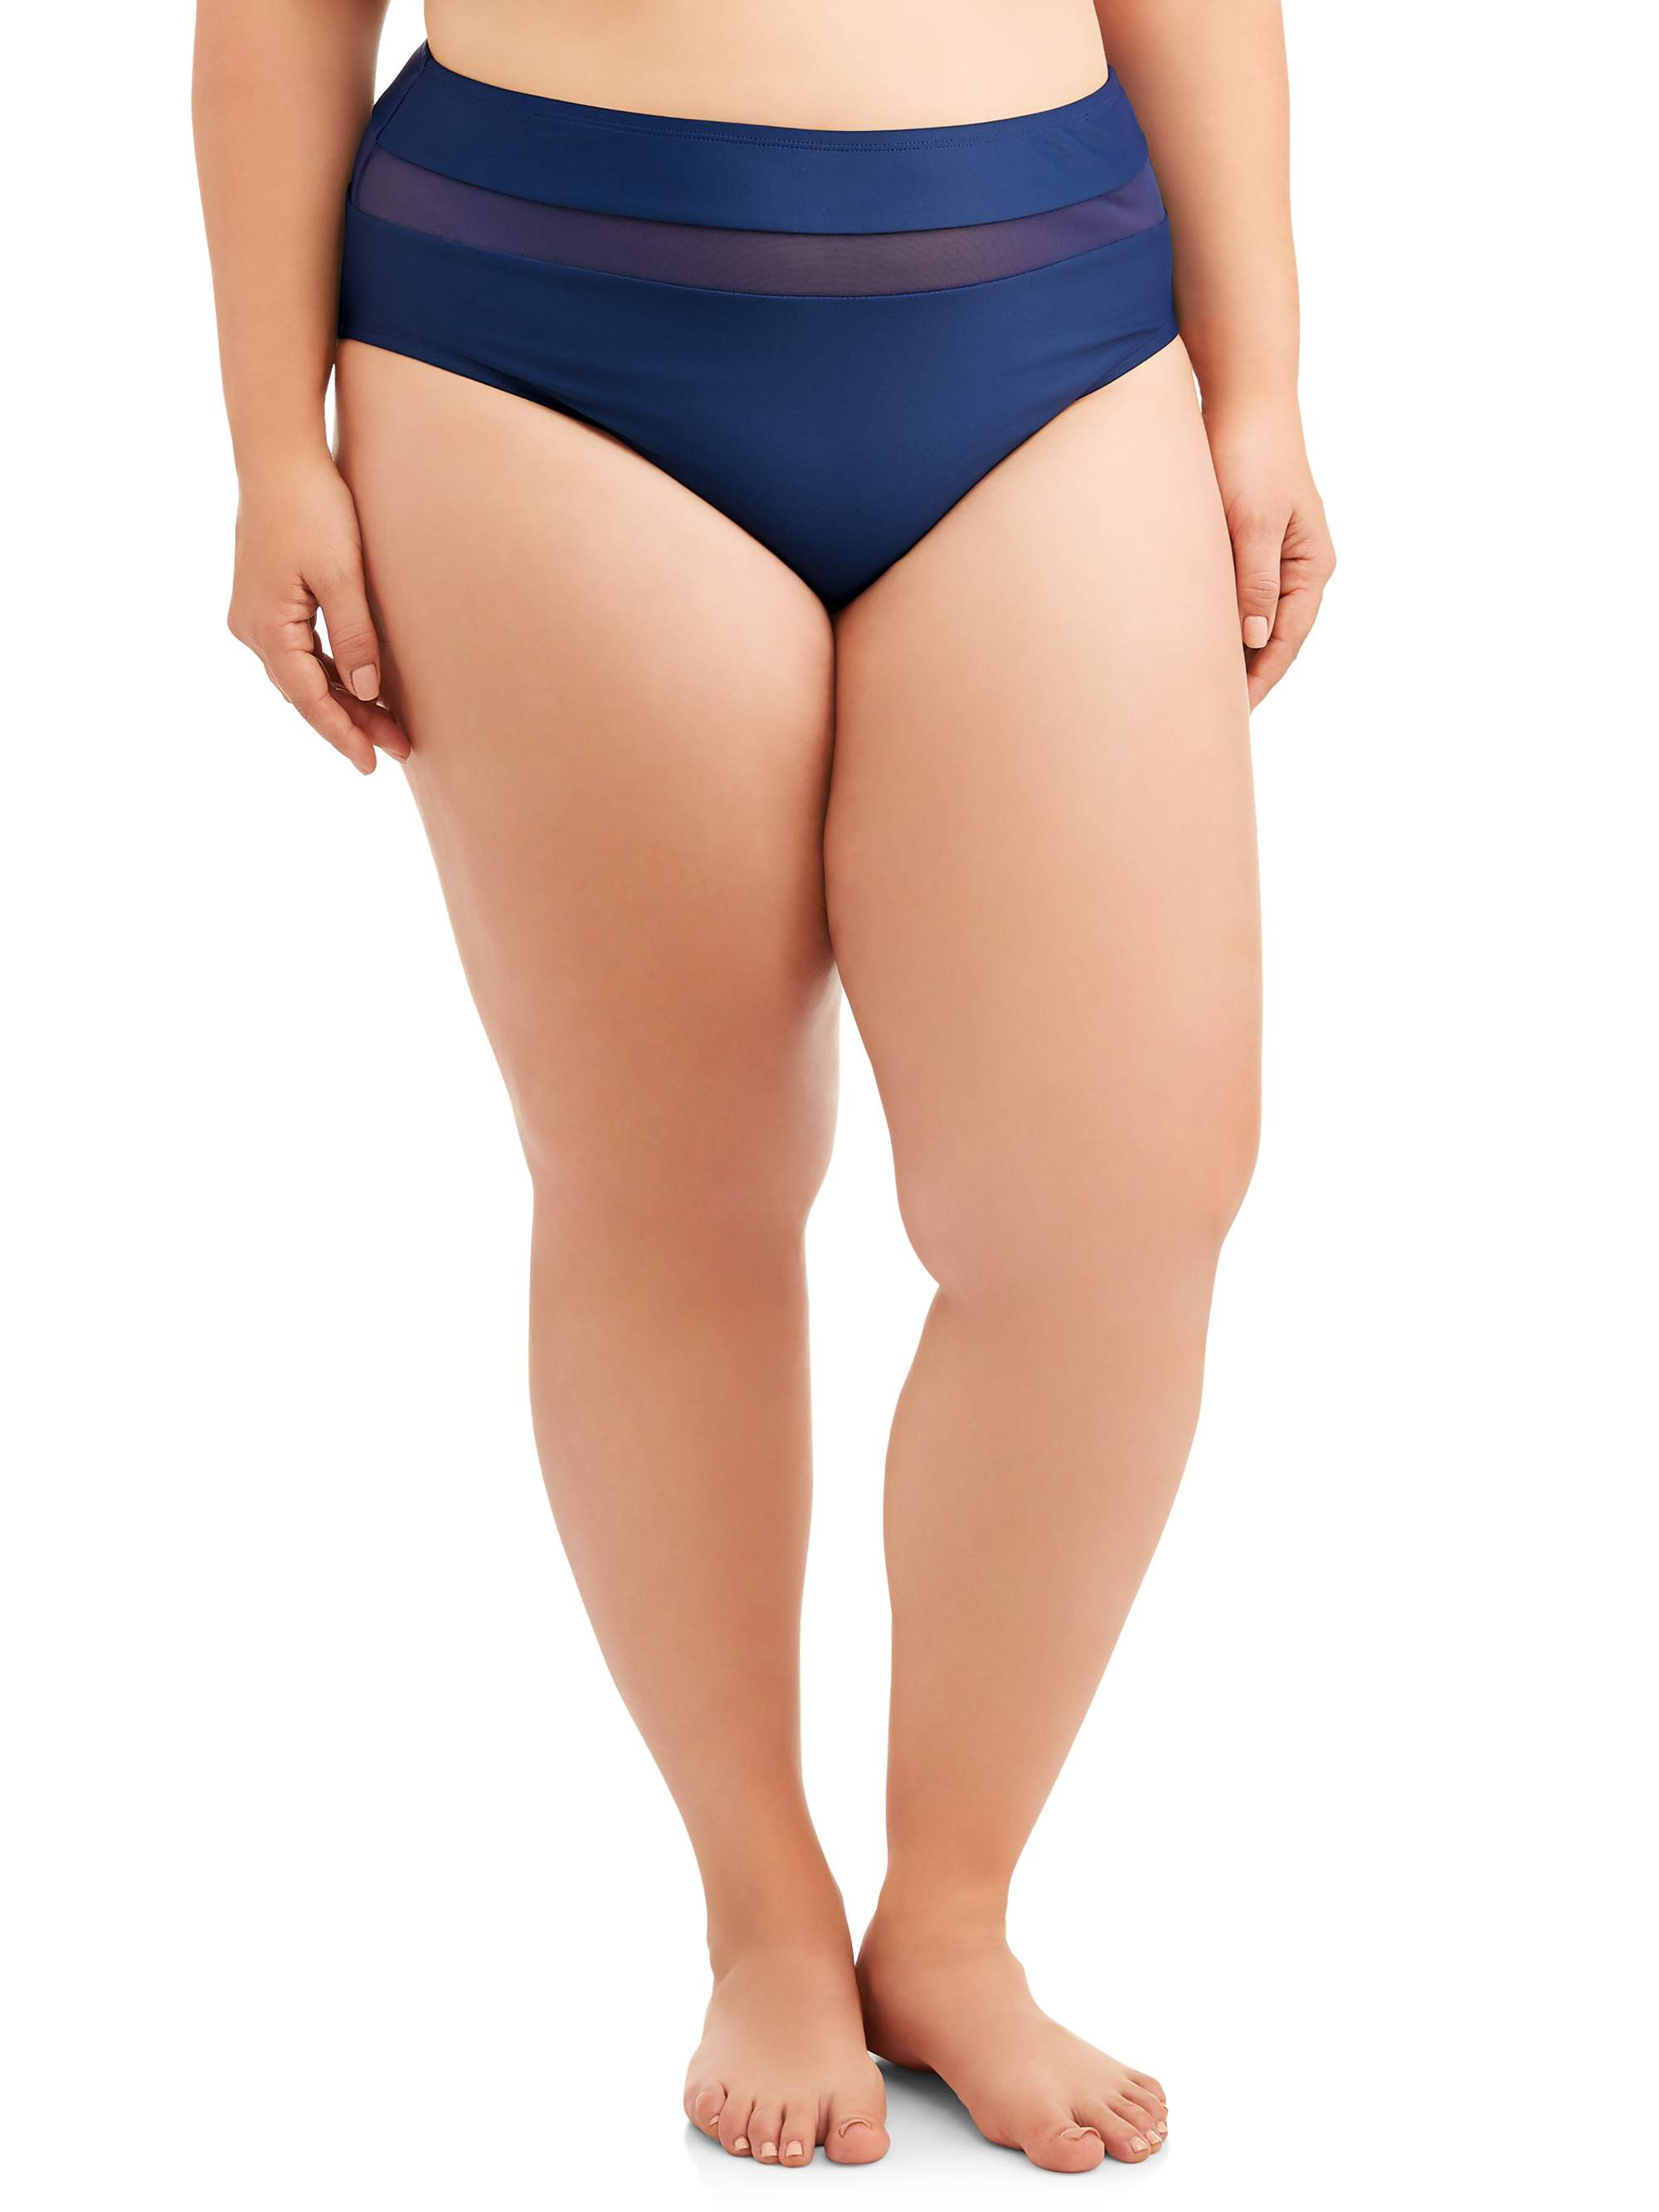 Women's Plus Size Mesh Insert High Waist Swimsuit Bottom